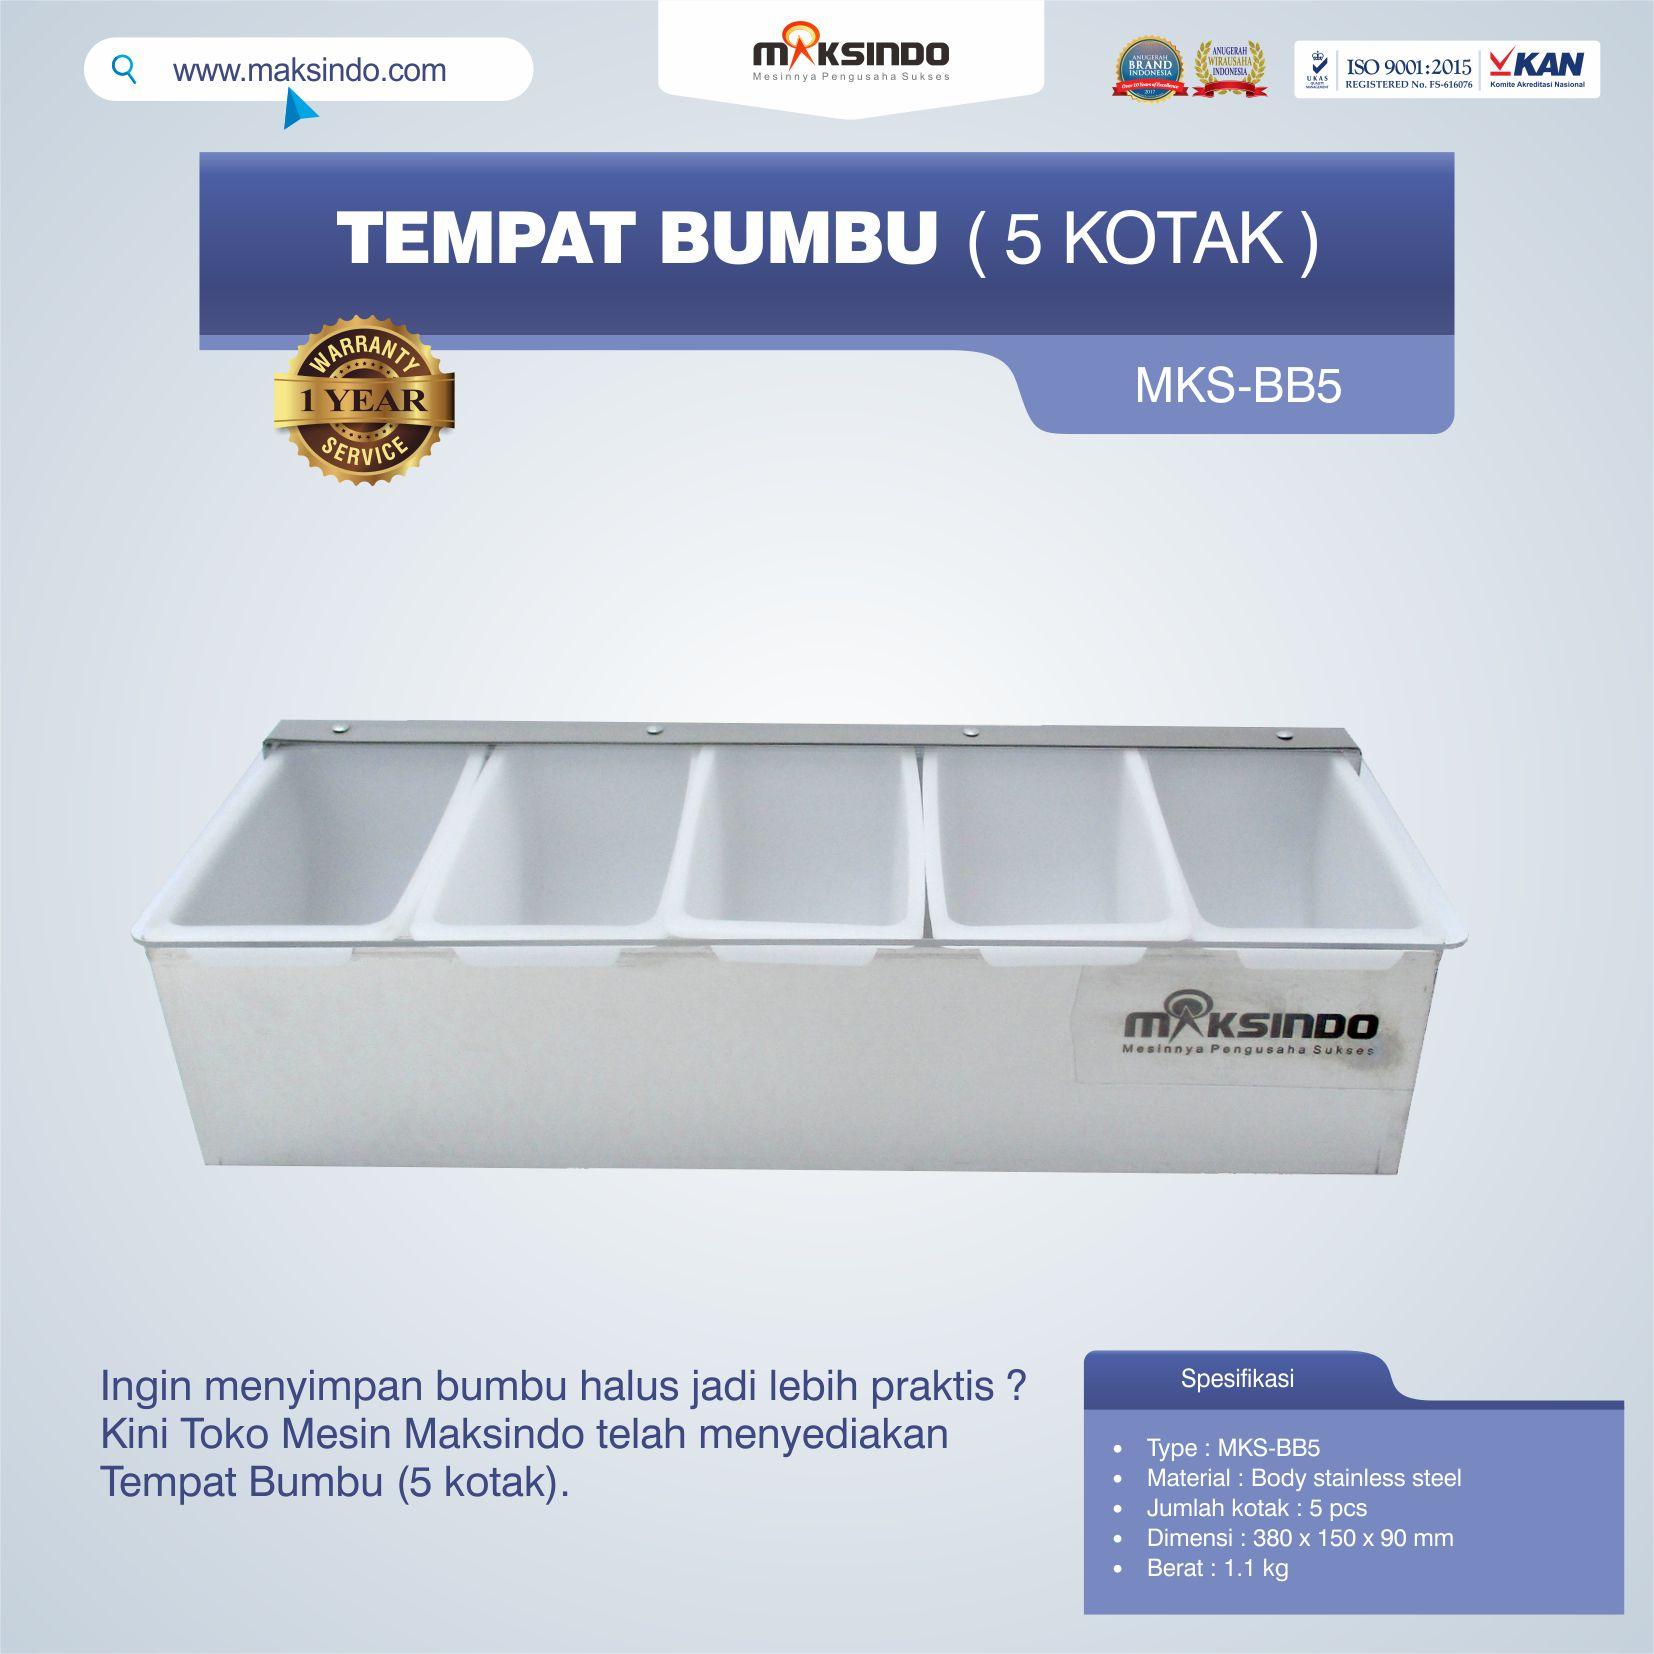 Jual Tempat Bumbu (5 Kotak) Di Bandung